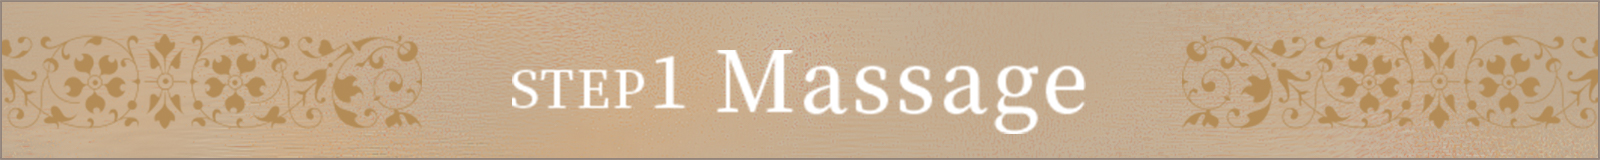 Step01 Massage